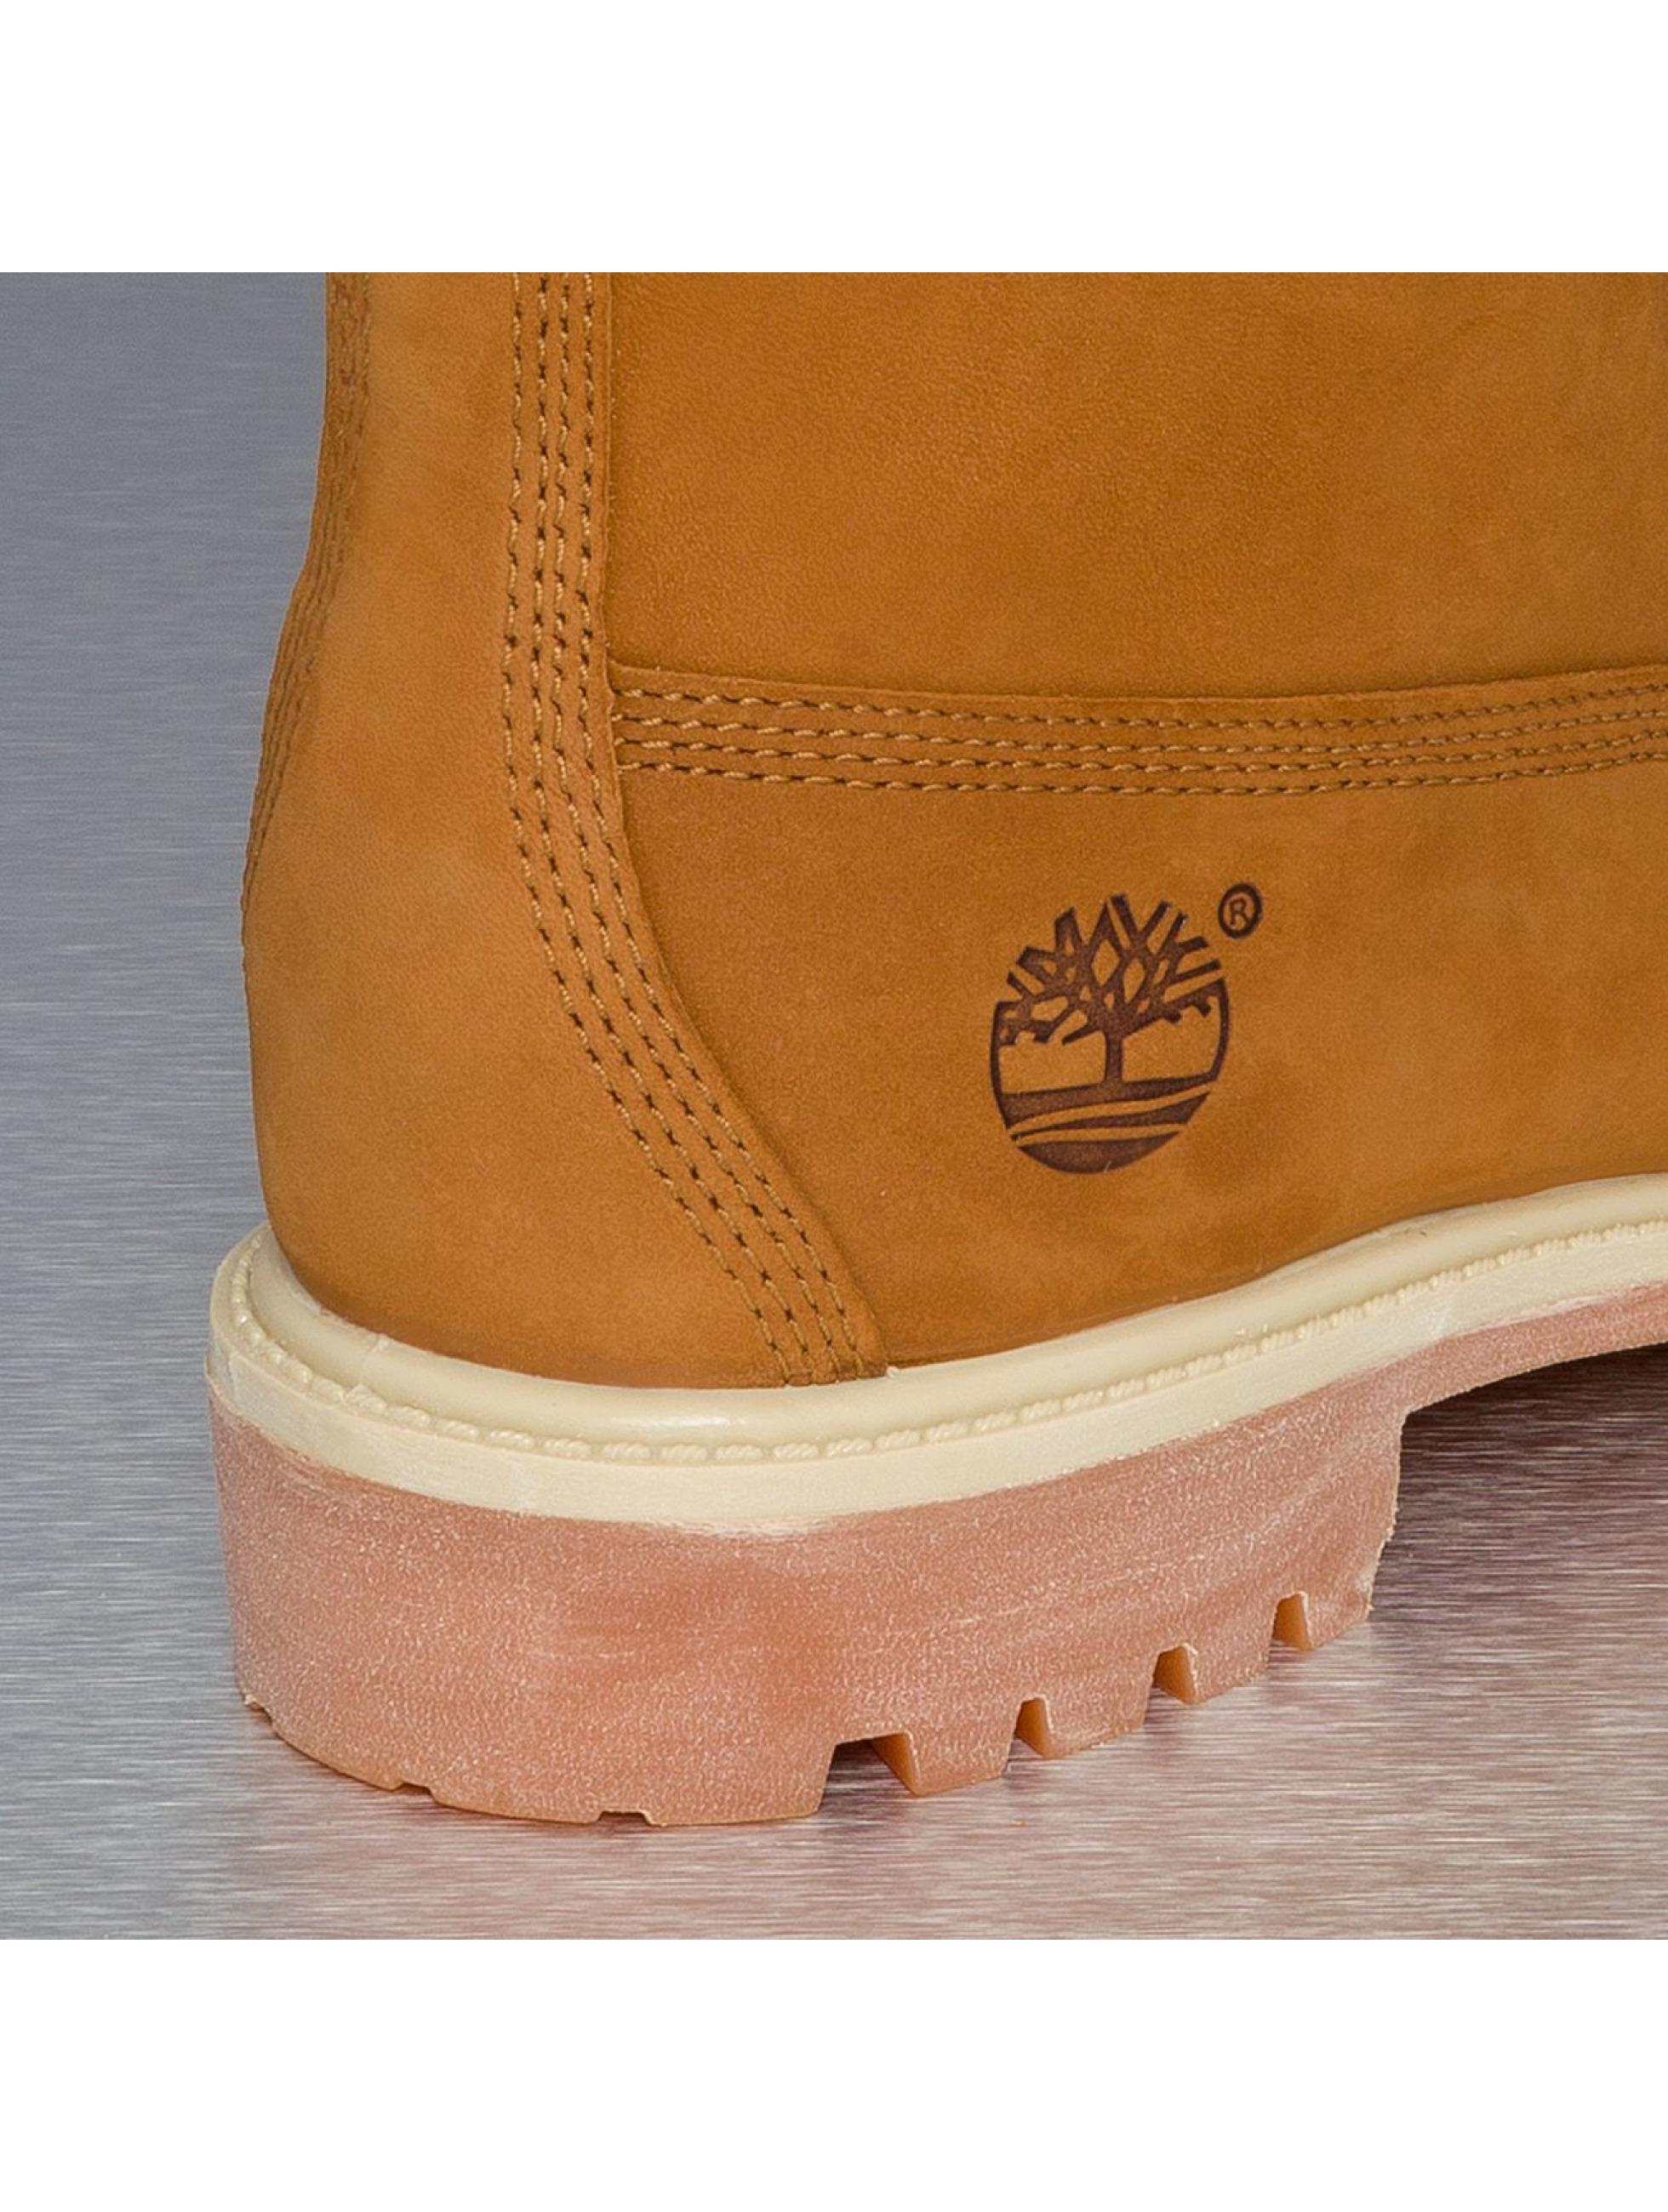 Timberland Boots Af 6in Prem braun